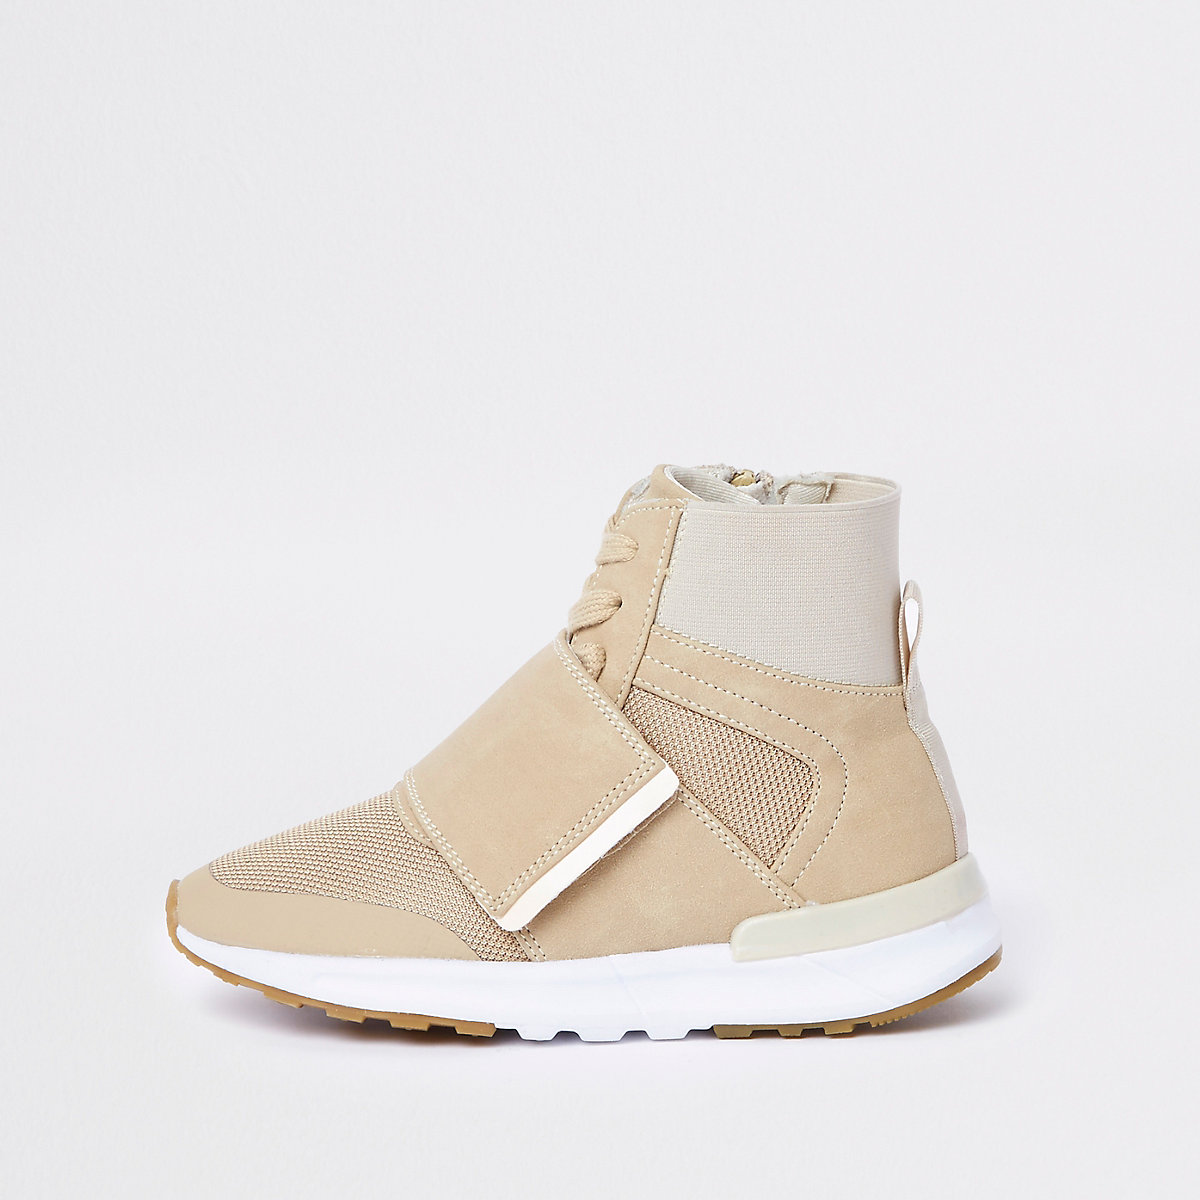 Kids beige high top sports sneakers